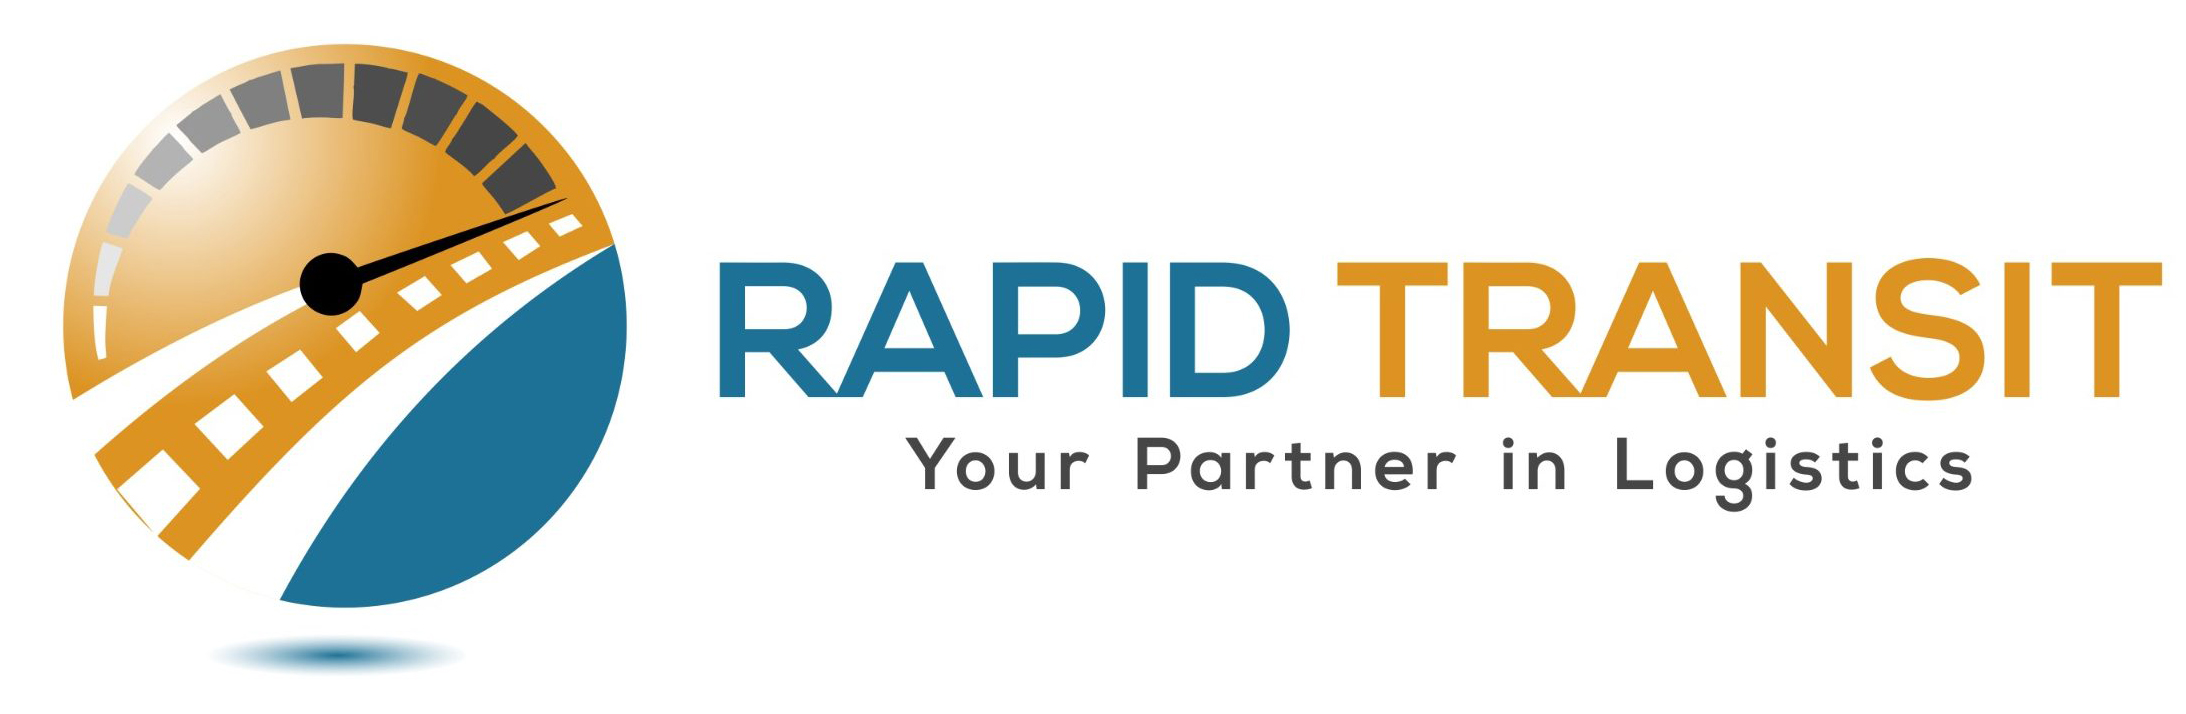 rapidtransit